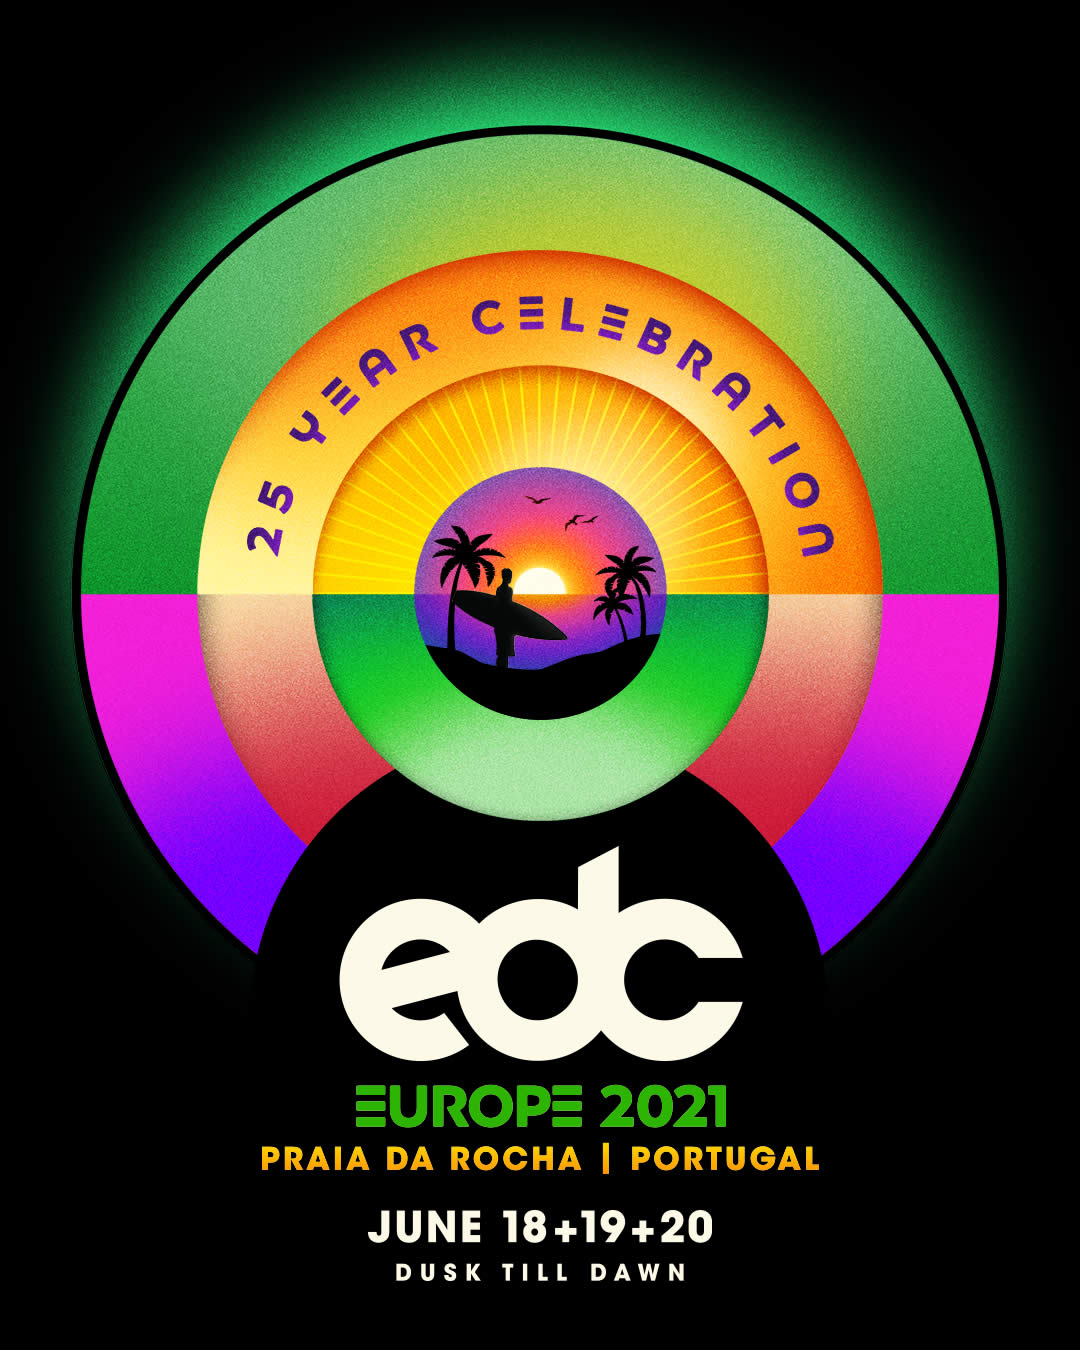 Cartel-EDC-Europe-2021.jpg